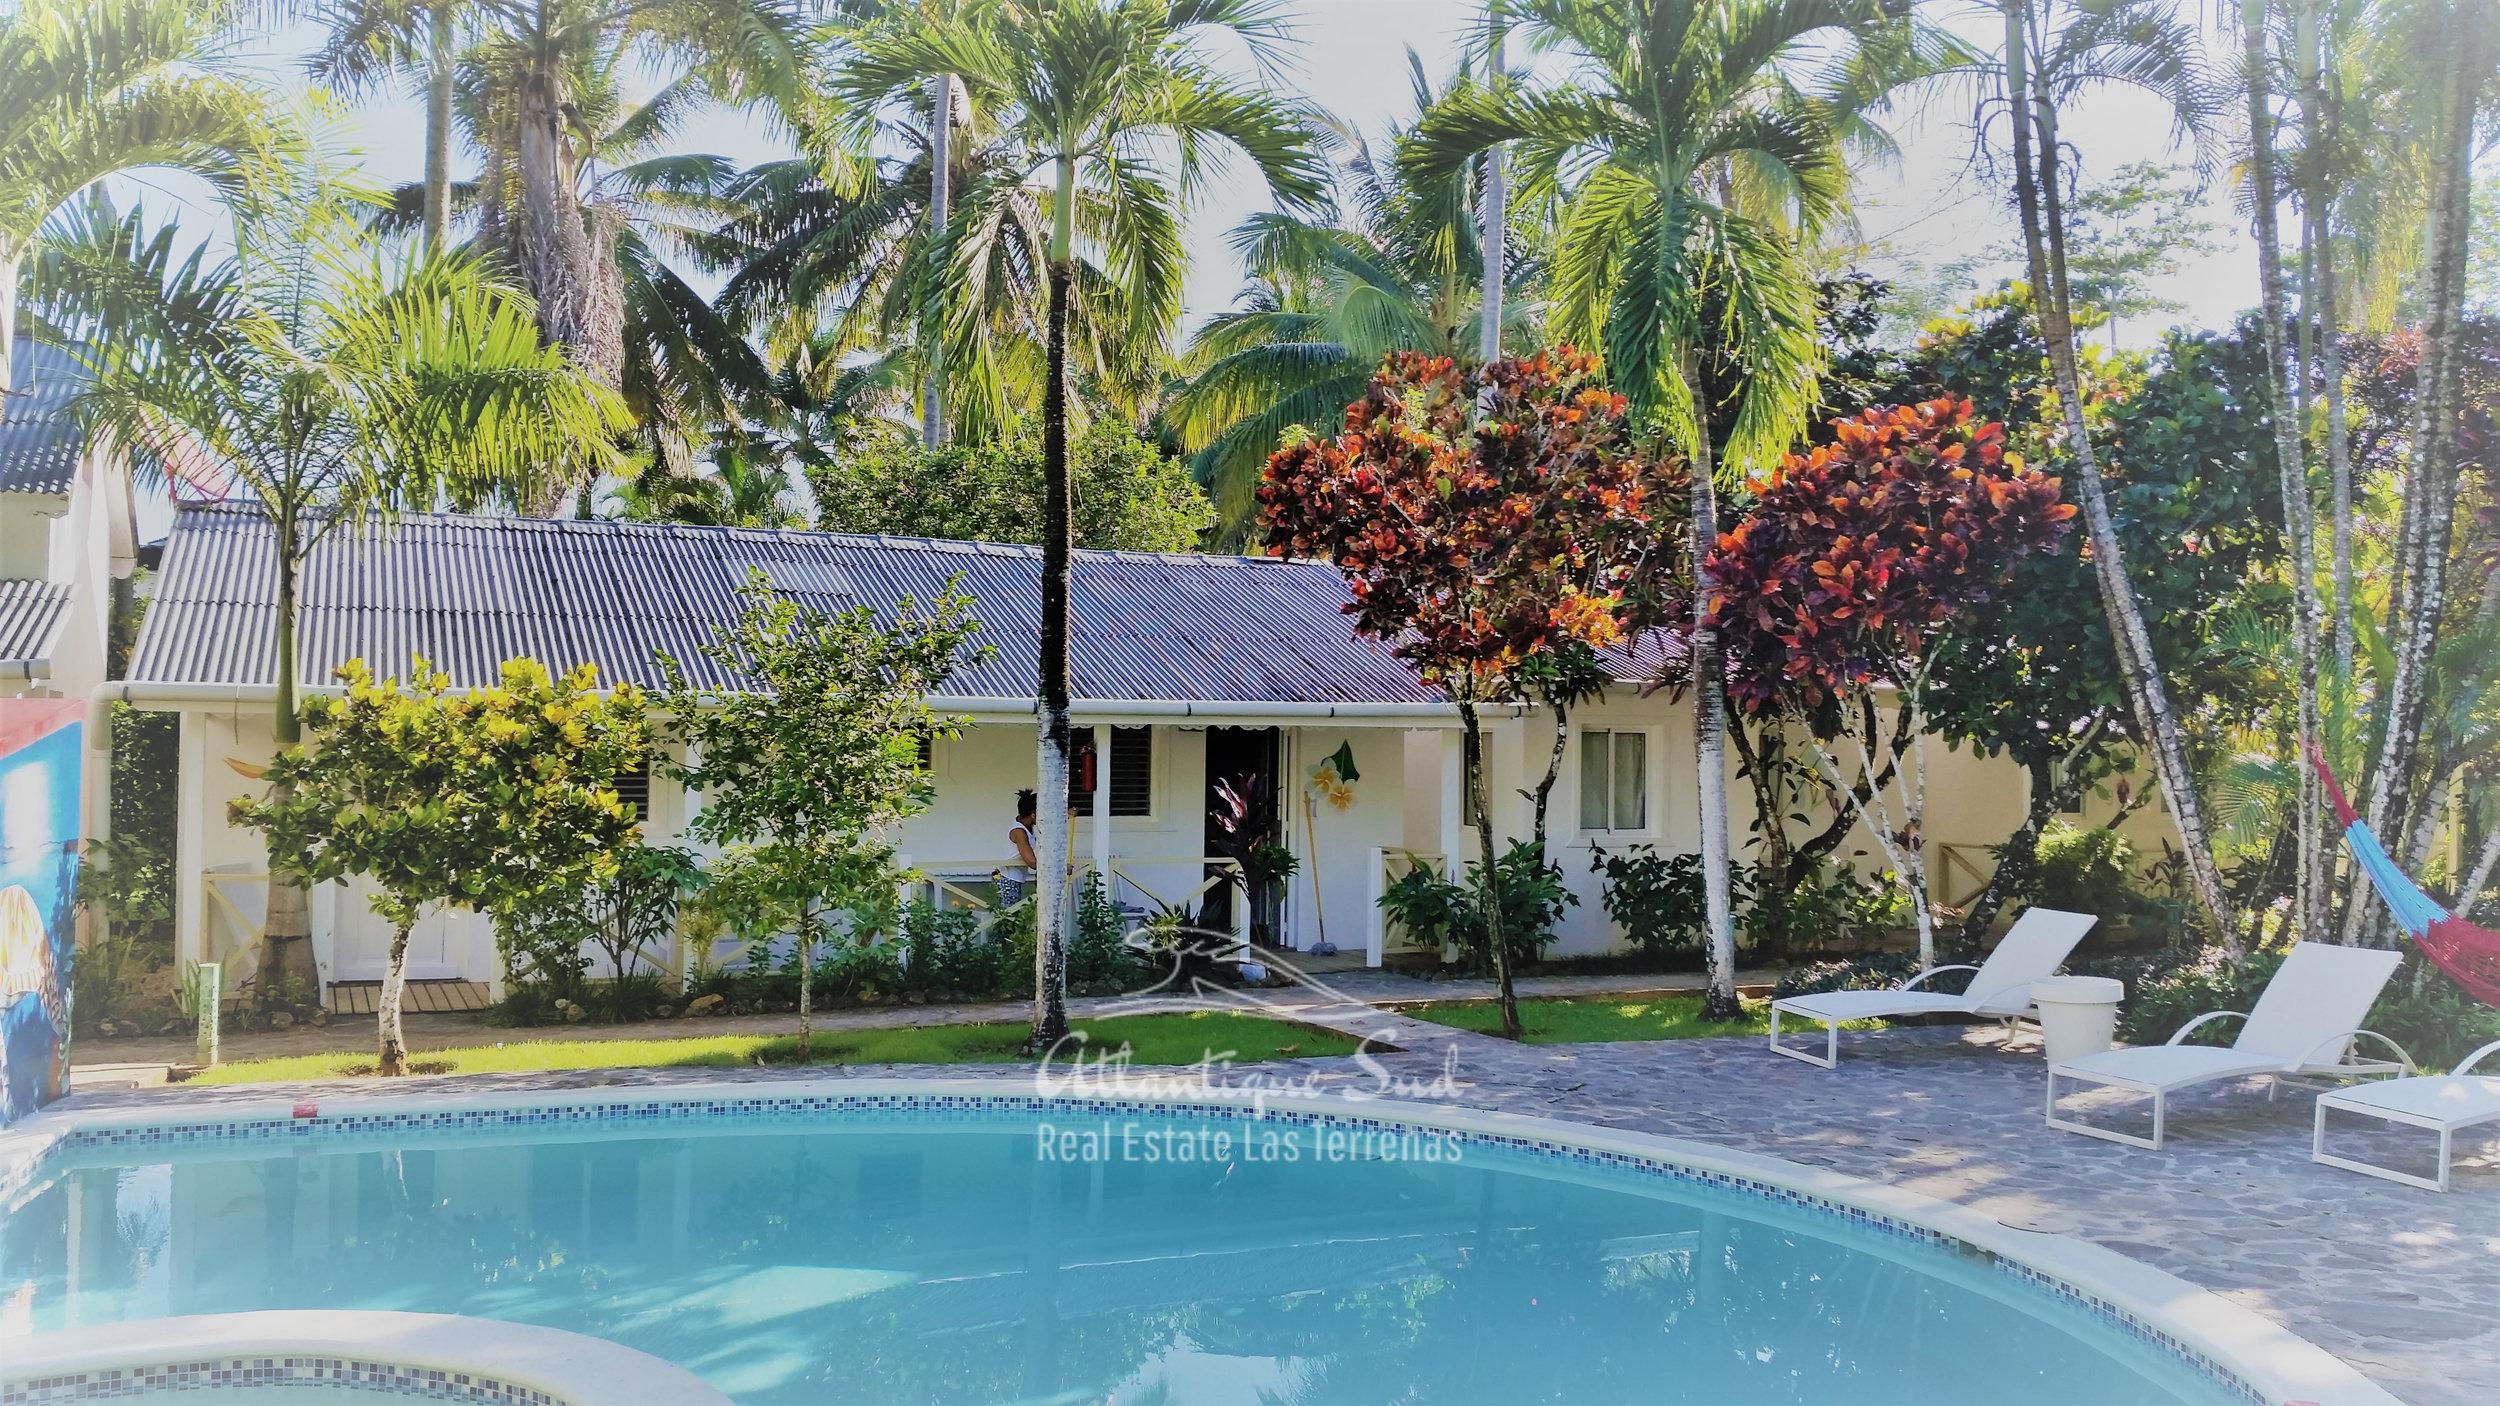 Small hotel for sale next to the beach Real Estate Las Terrenas Atlantique Sud Dominican Republic7.jpg